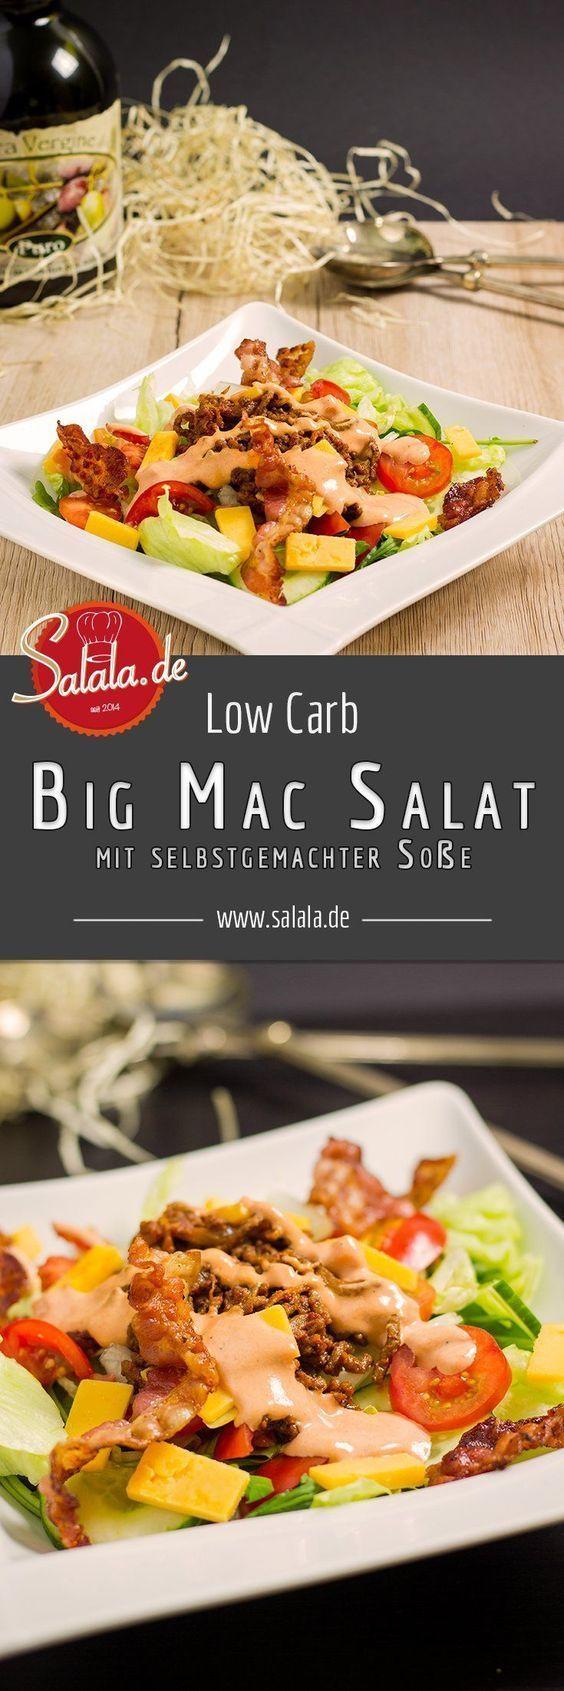 Big Mac Salat mit Bacon Low Carb   salala.de – Low Carb leicht gemacht